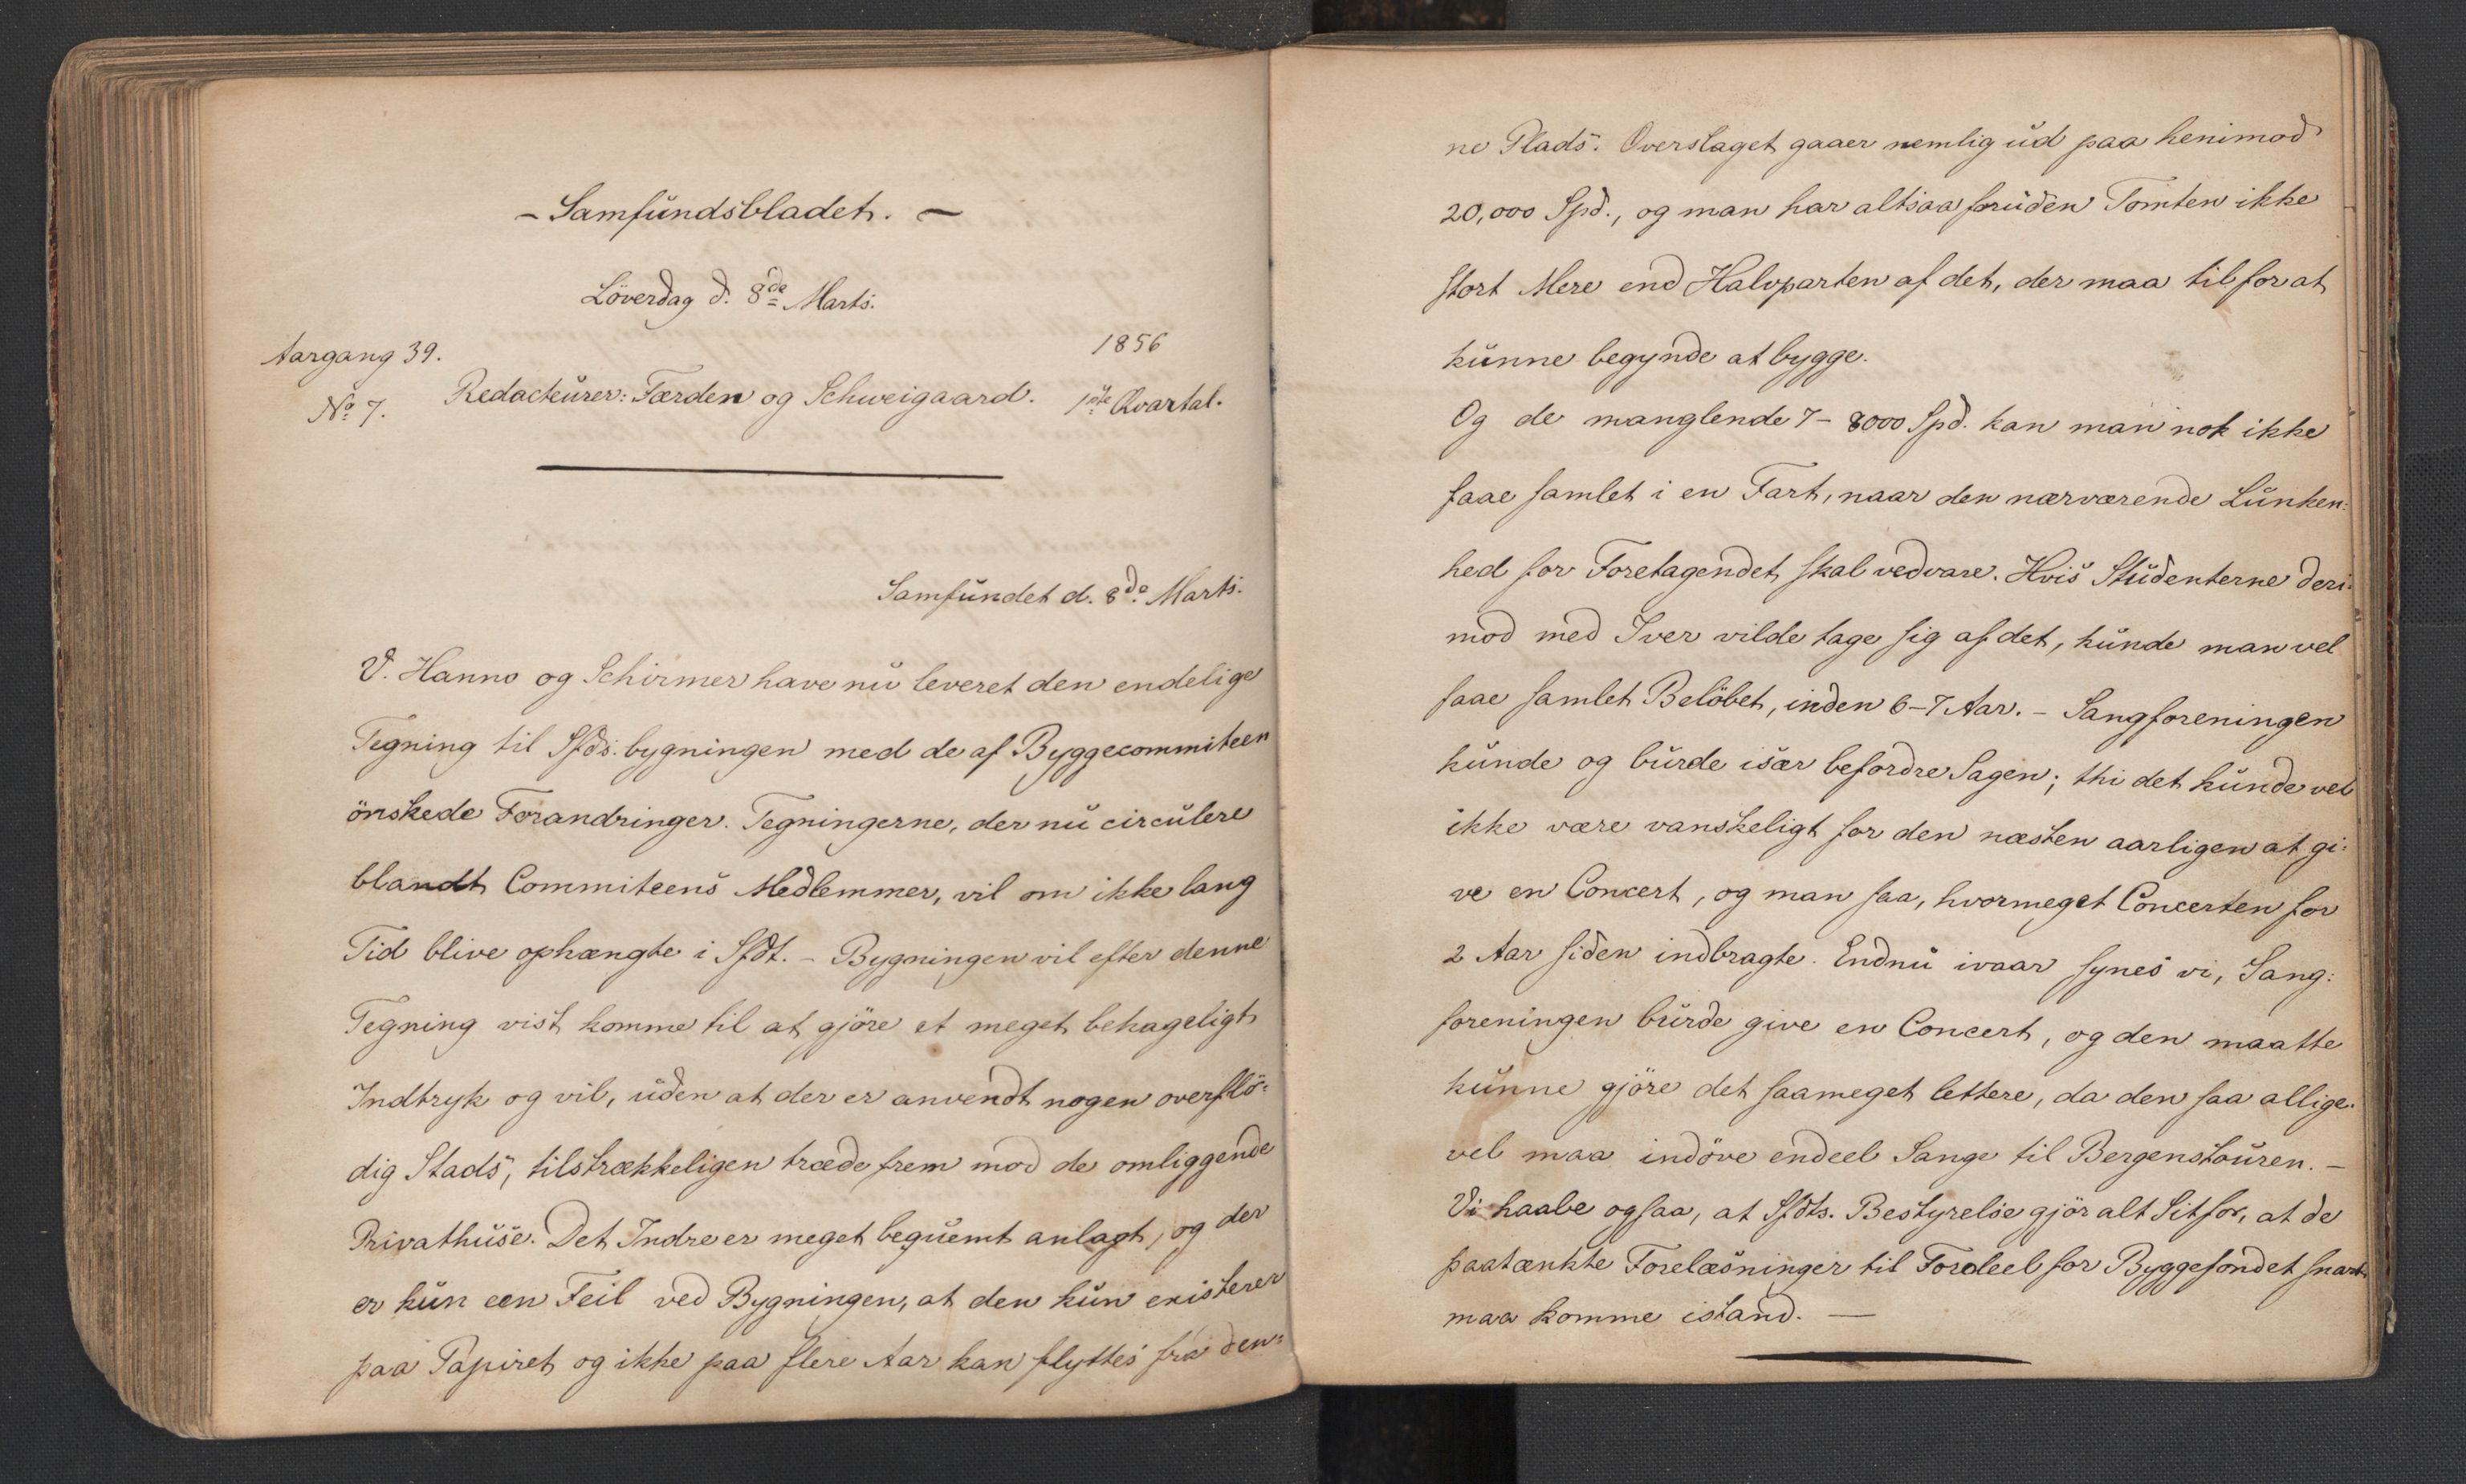 RA, Det Norske Studentersamfund, X/Xa/L0005, 1855-1856, s. 165